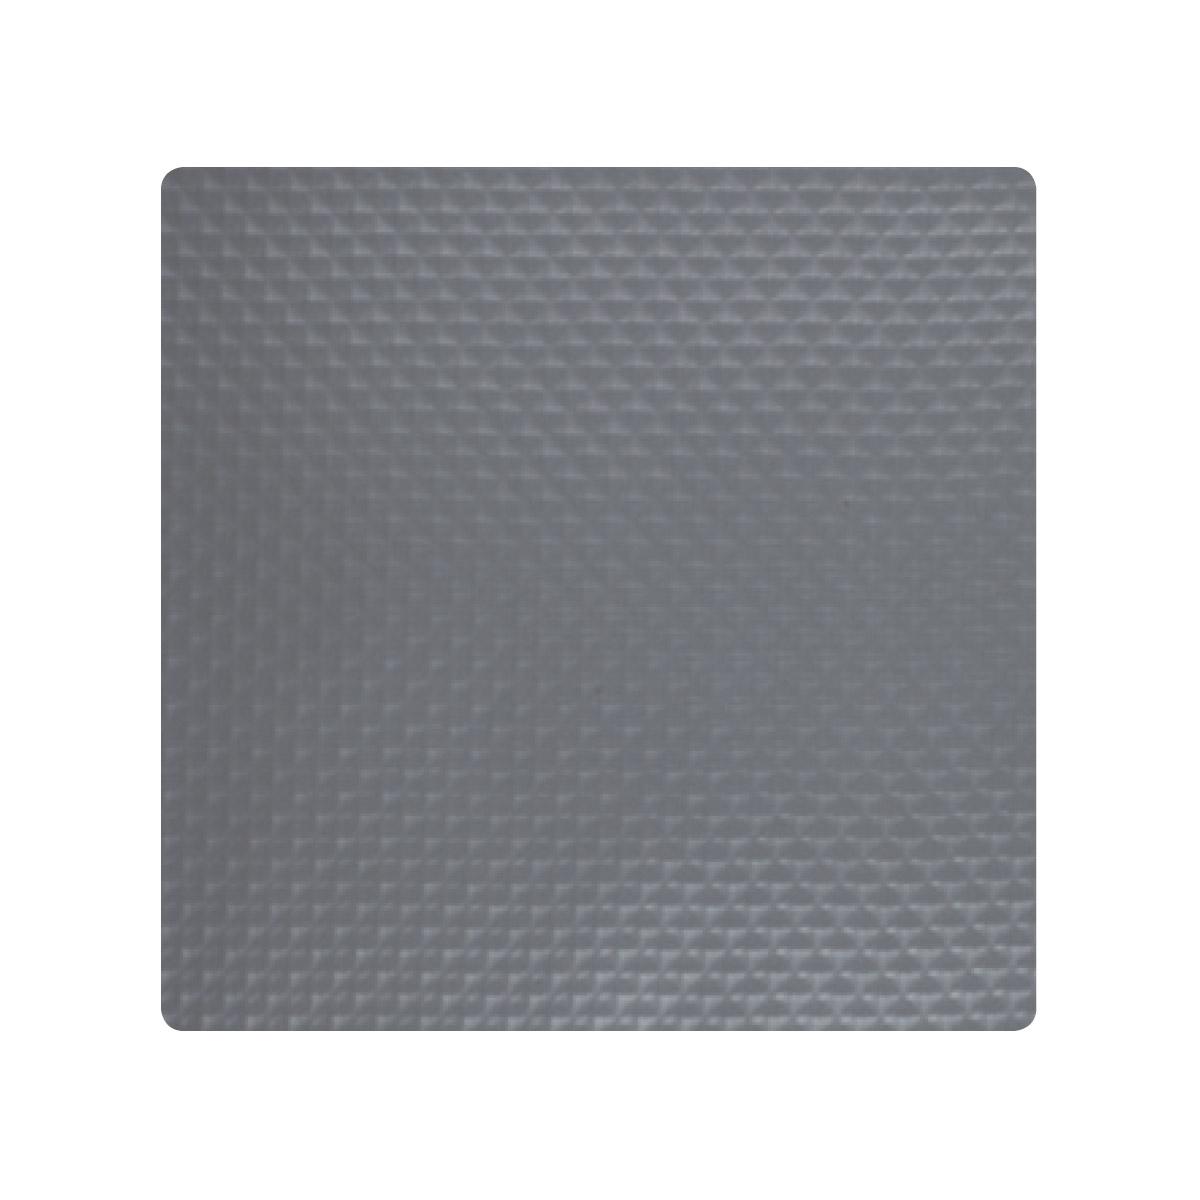 Swimming pool liner deluxe light grey, 165 cm Swimming pool liner deluxe light grey, 165 cm